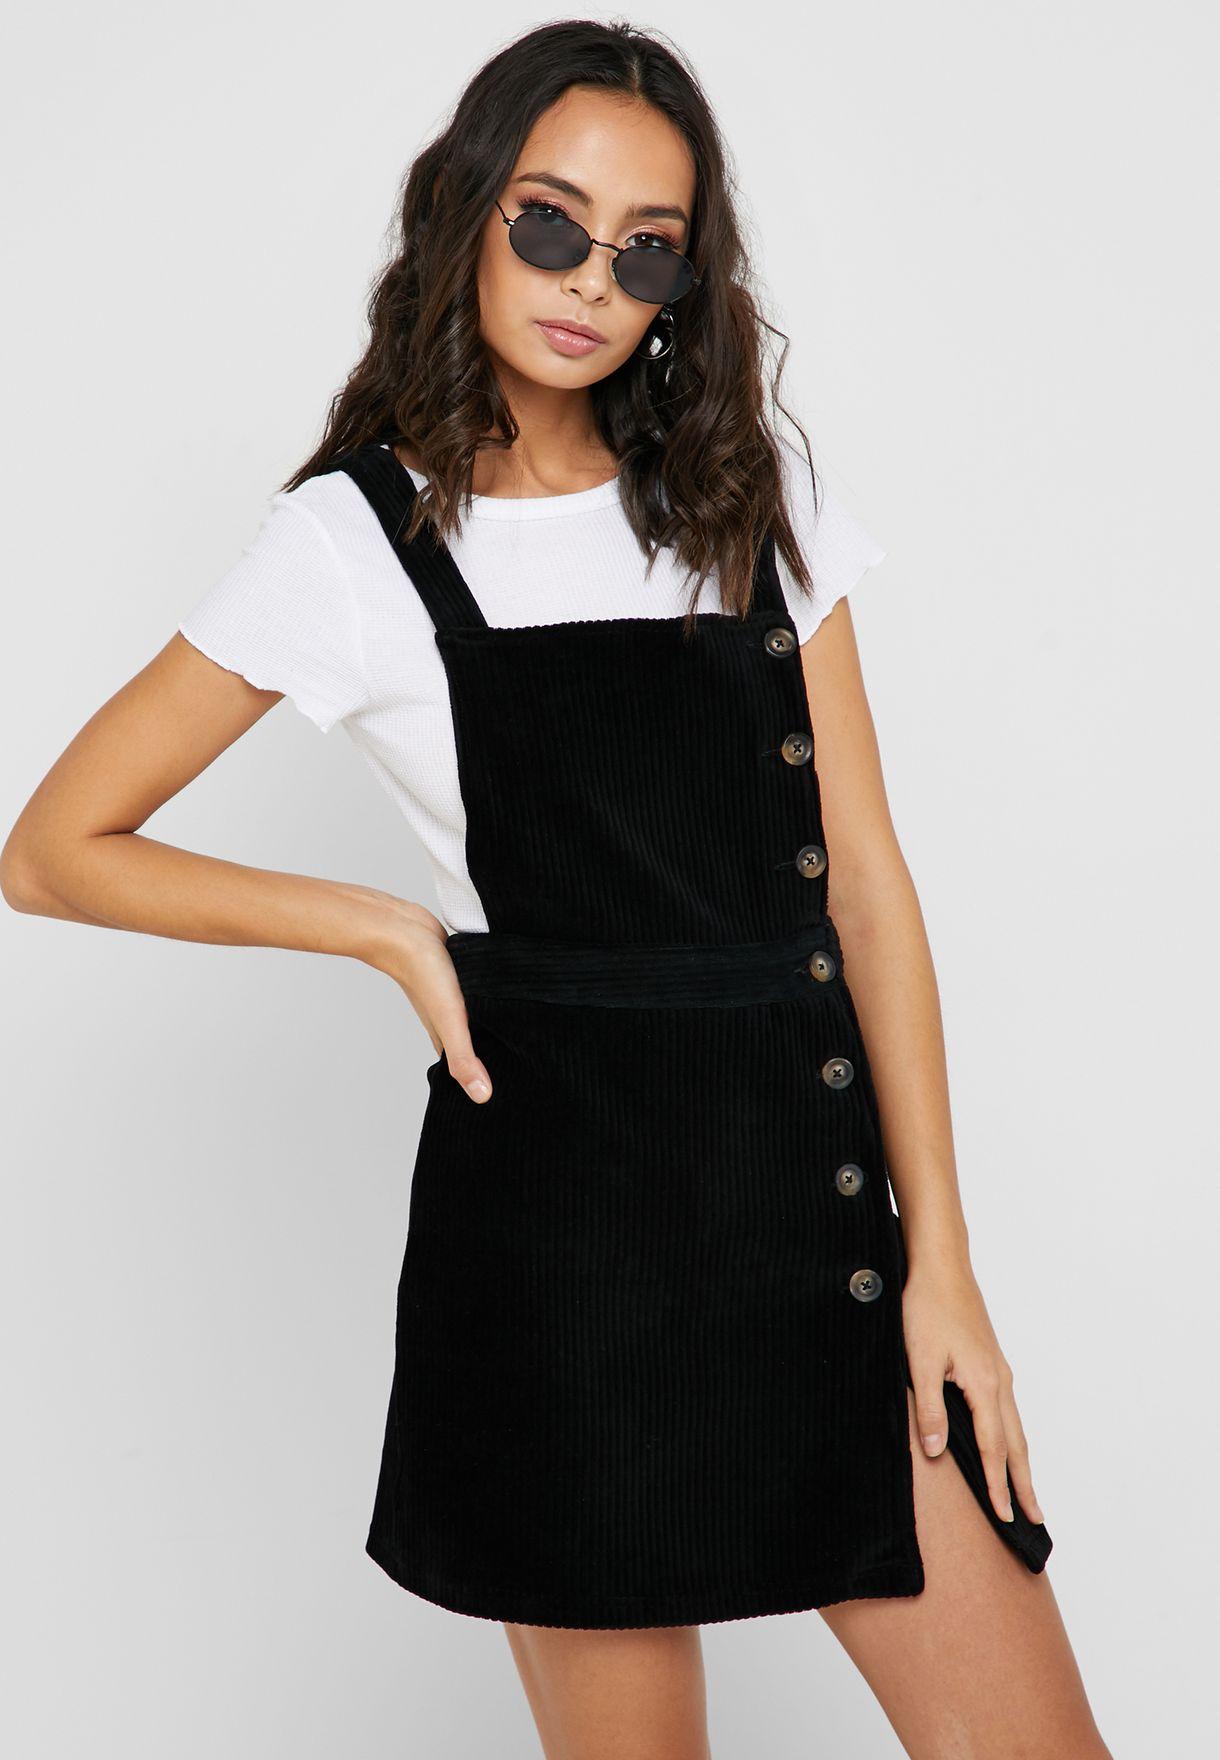 sells a few days away detailing Button Corduroy Pinafore Dress